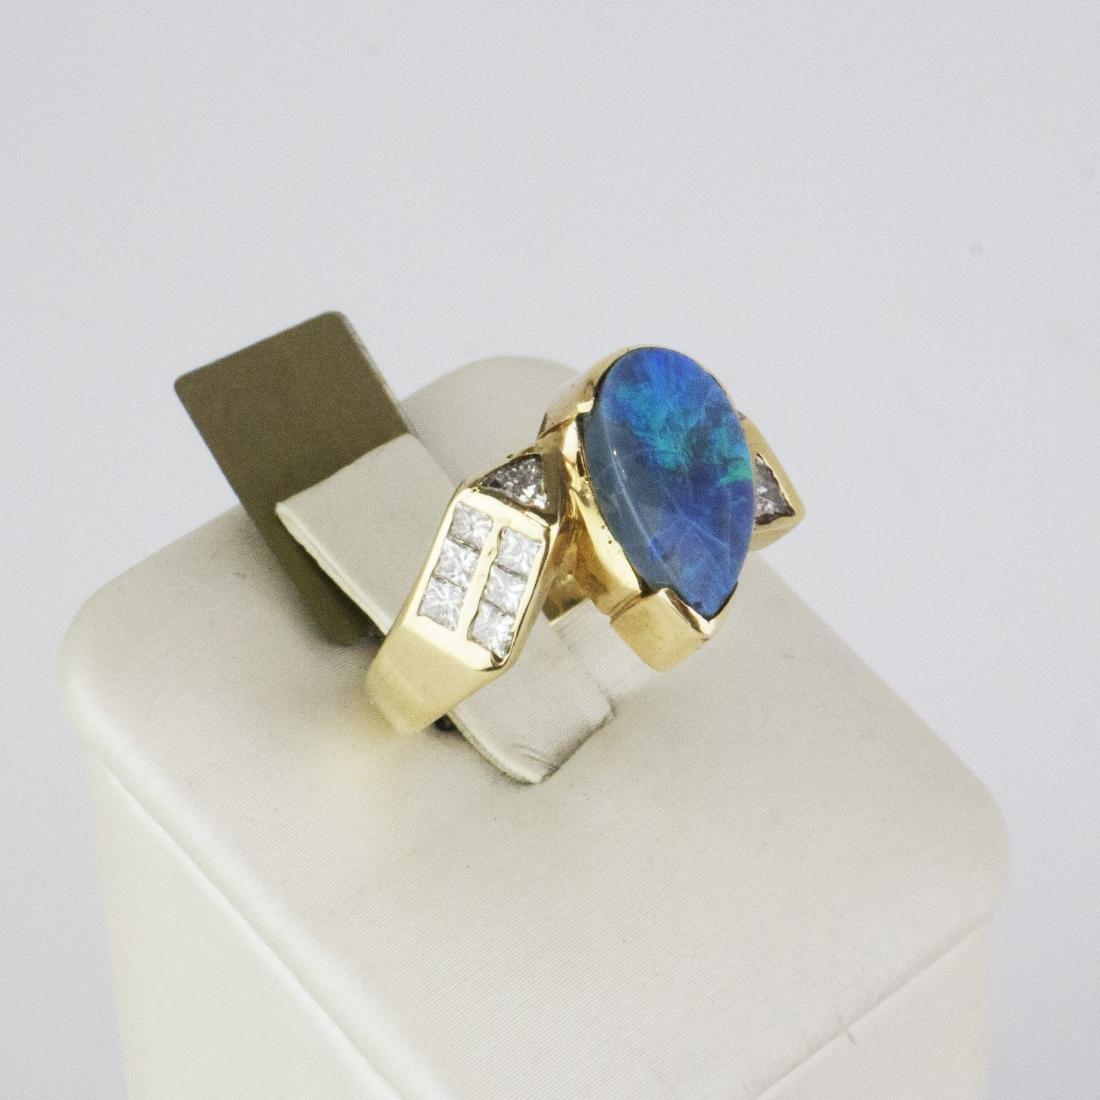 14K Yellow Gold Austrian Opal Diamond Ring - 3